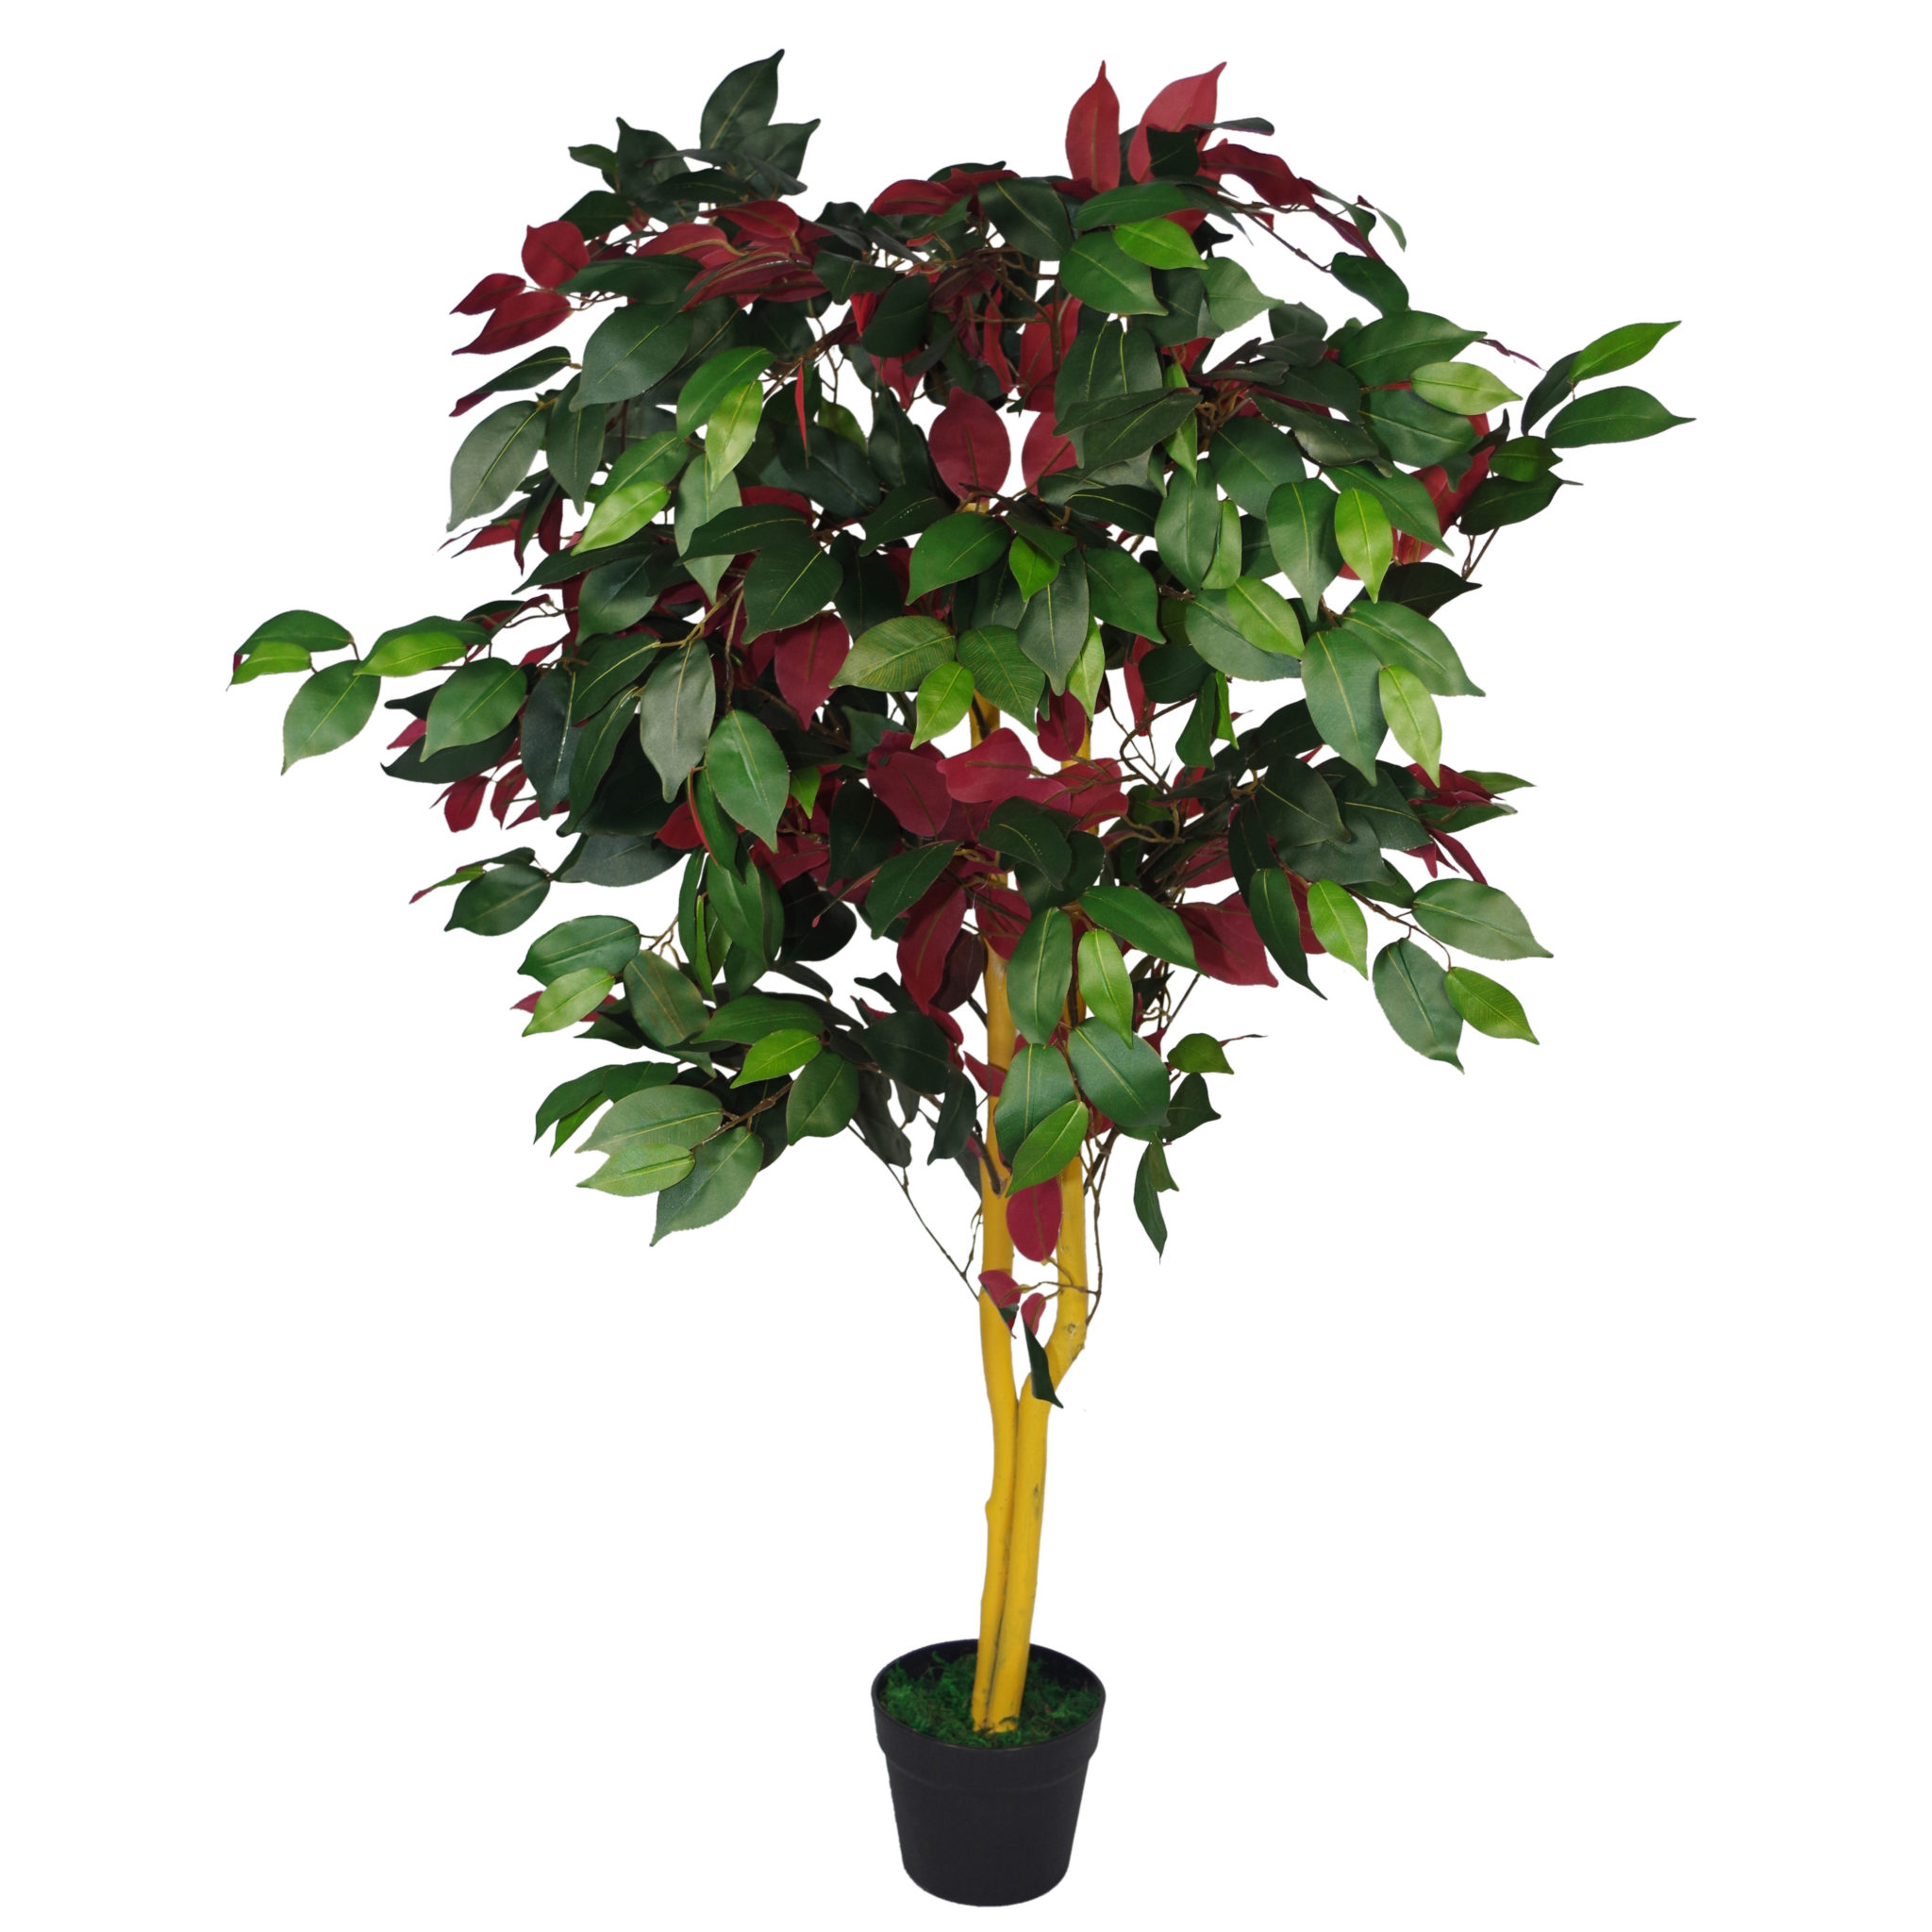 120cm (4ft) Artificial Capensia Tree Ficus Plant - Extra Large